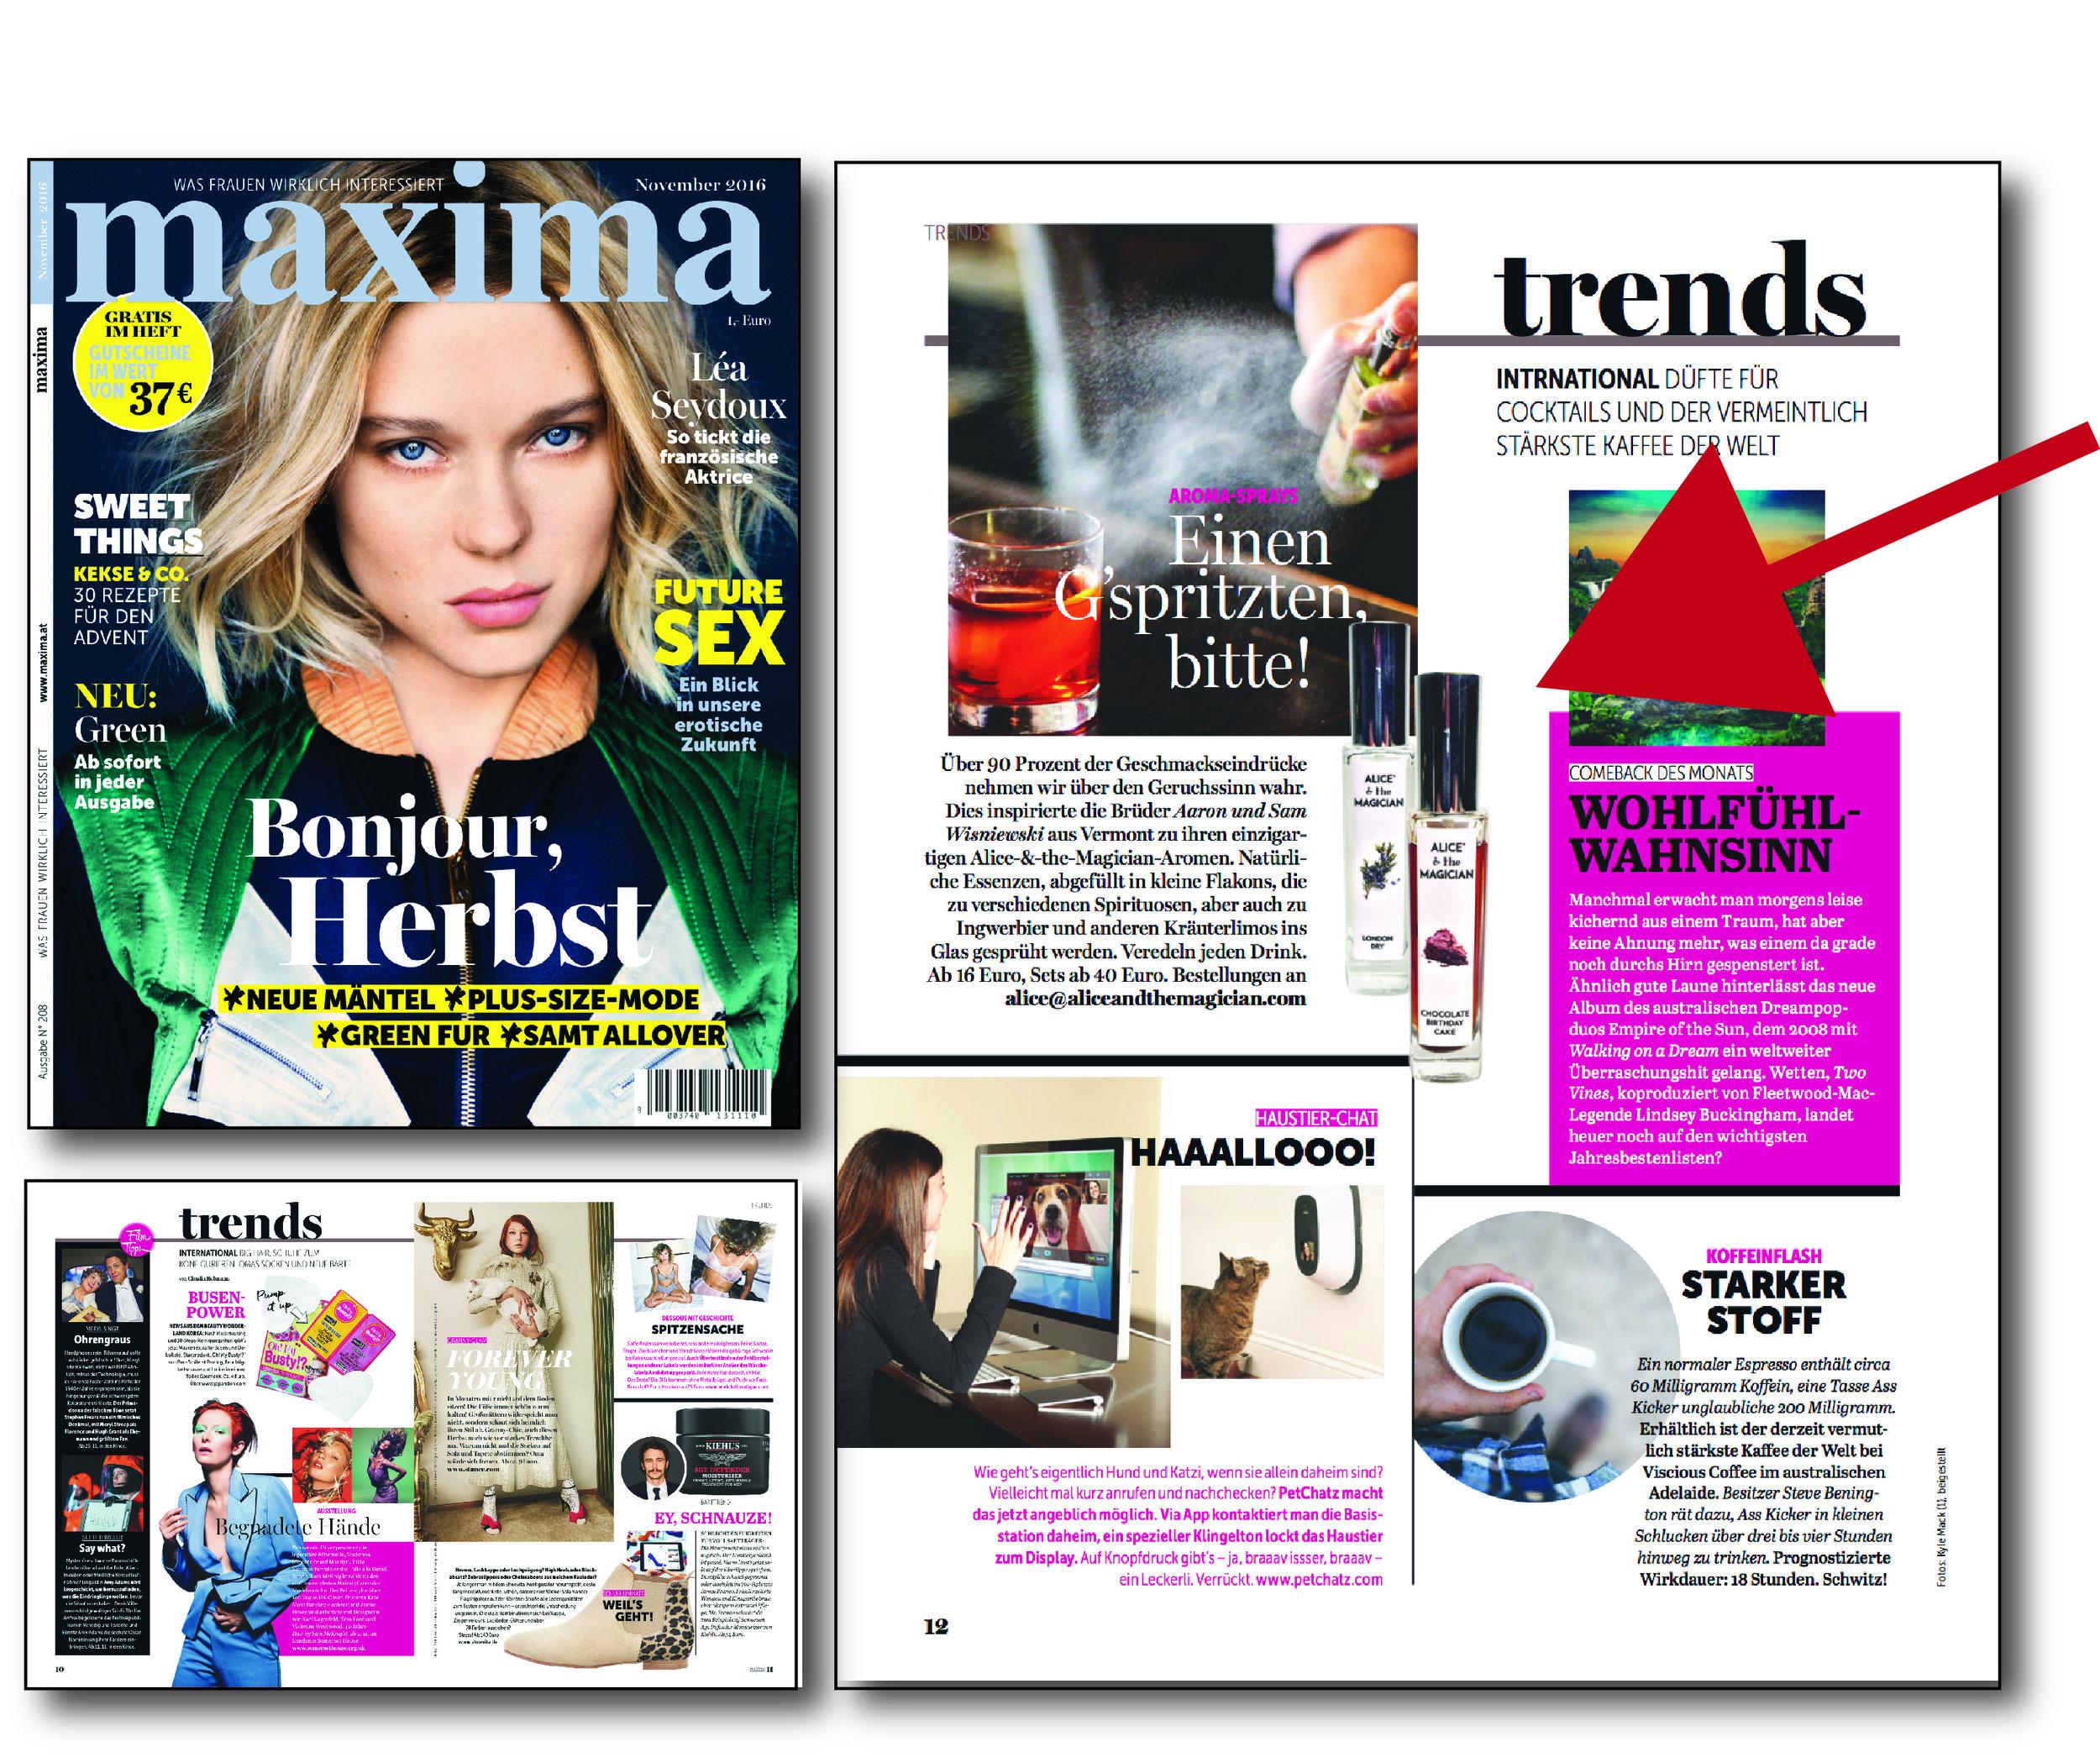 maxima magazine full spread.jpg